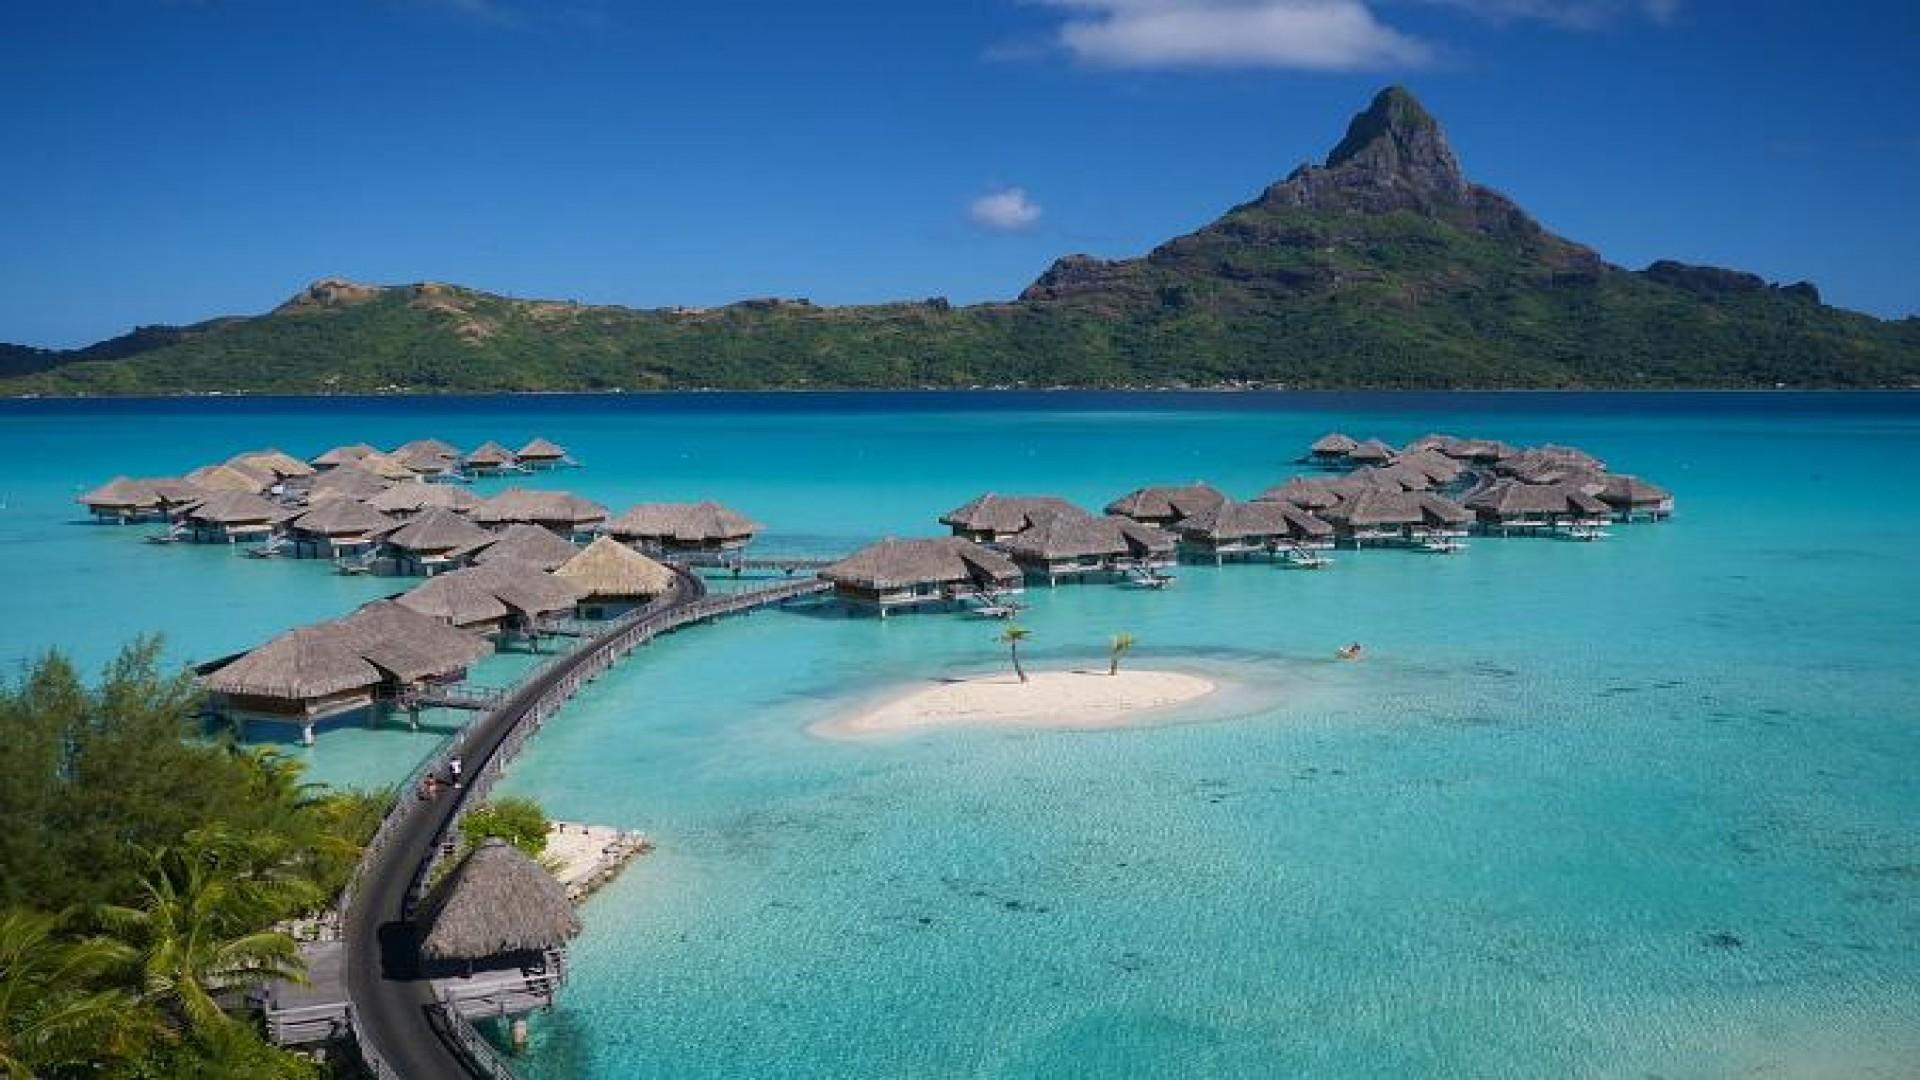 BATAM - THE ATTRACTIVE ISLAND